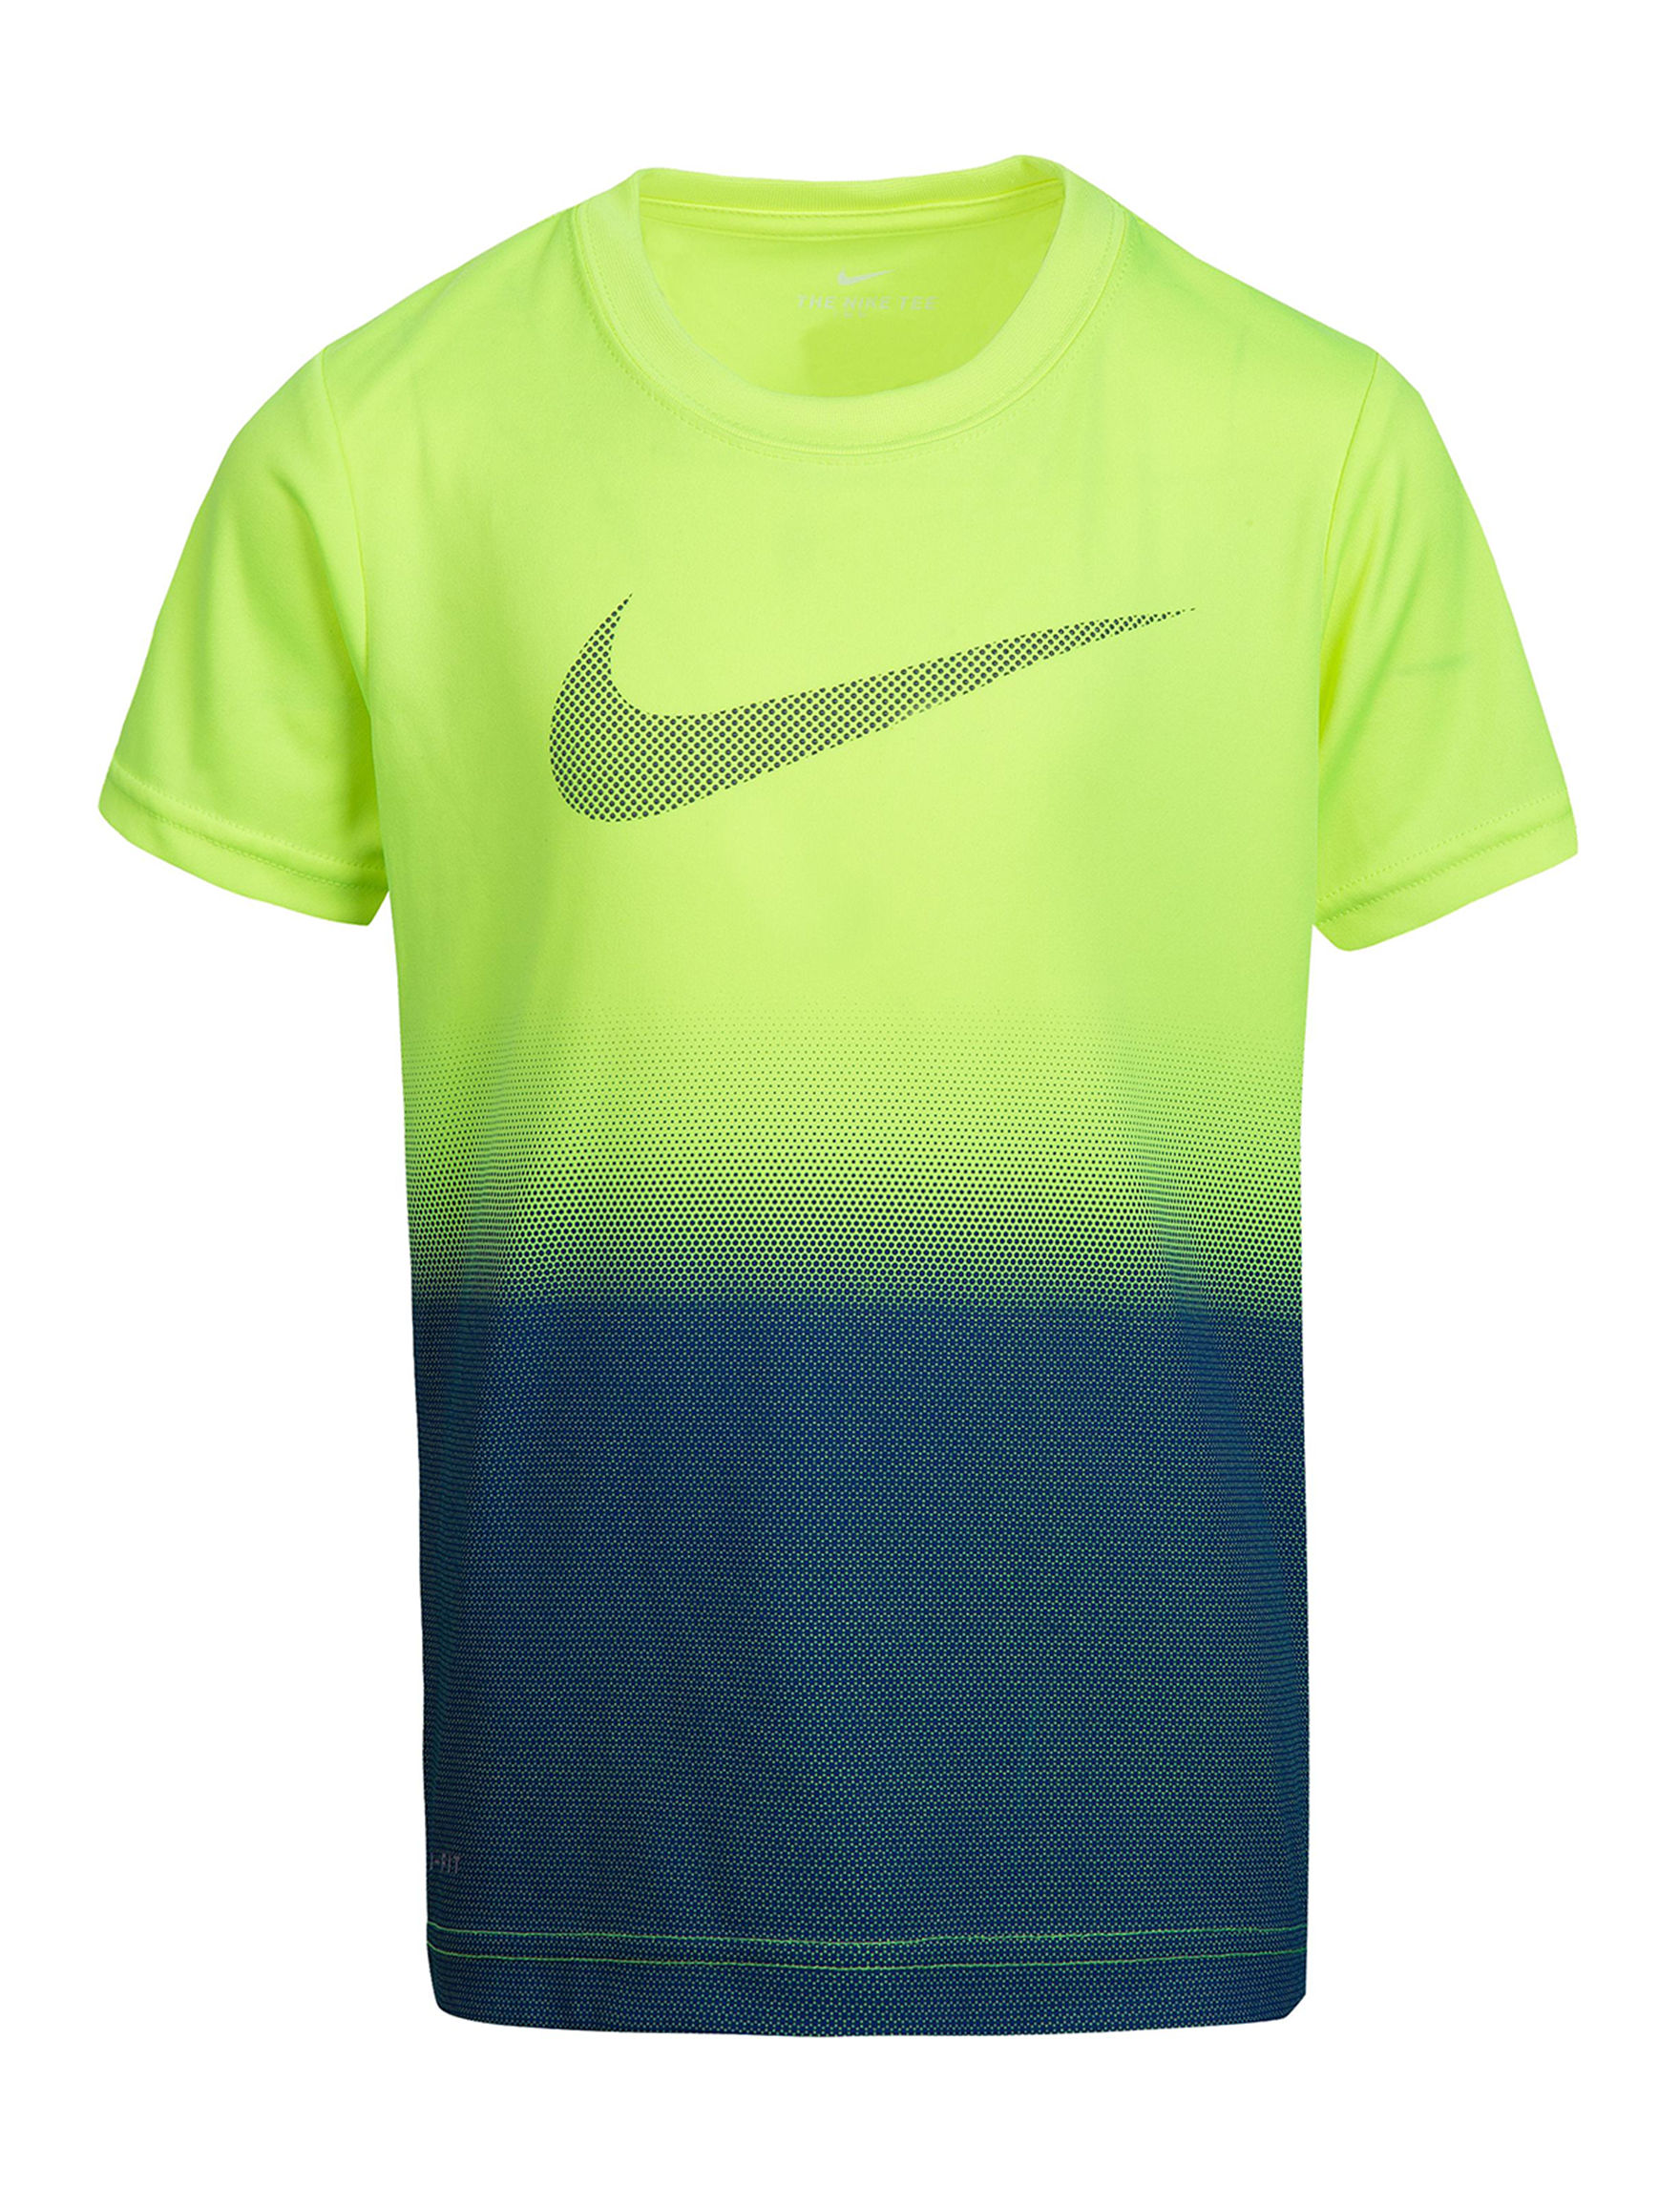 Nike Yellow Tees & Tanks